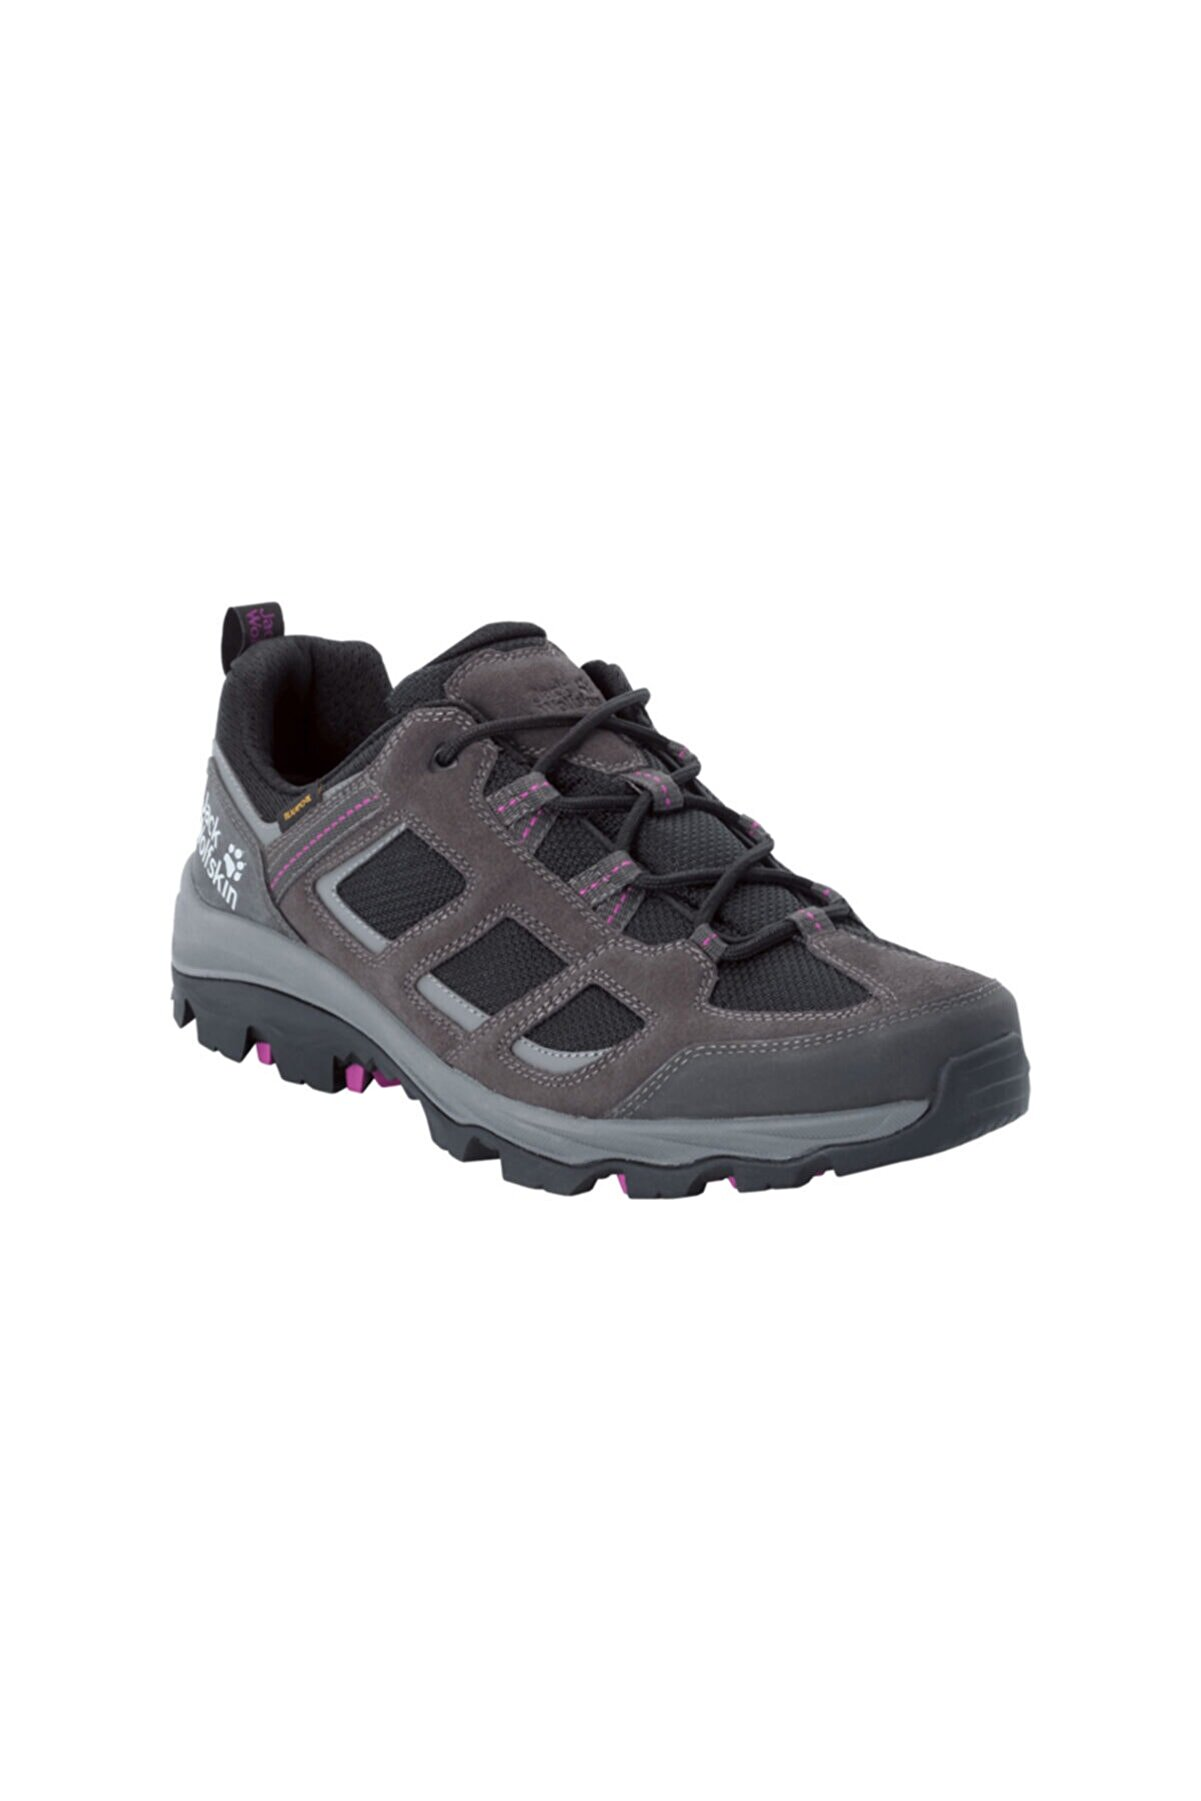 Jack Wolfskin Kadın Outdoor Ayakkabı Vojo 3 Texapore Low 4042451-6157 24476